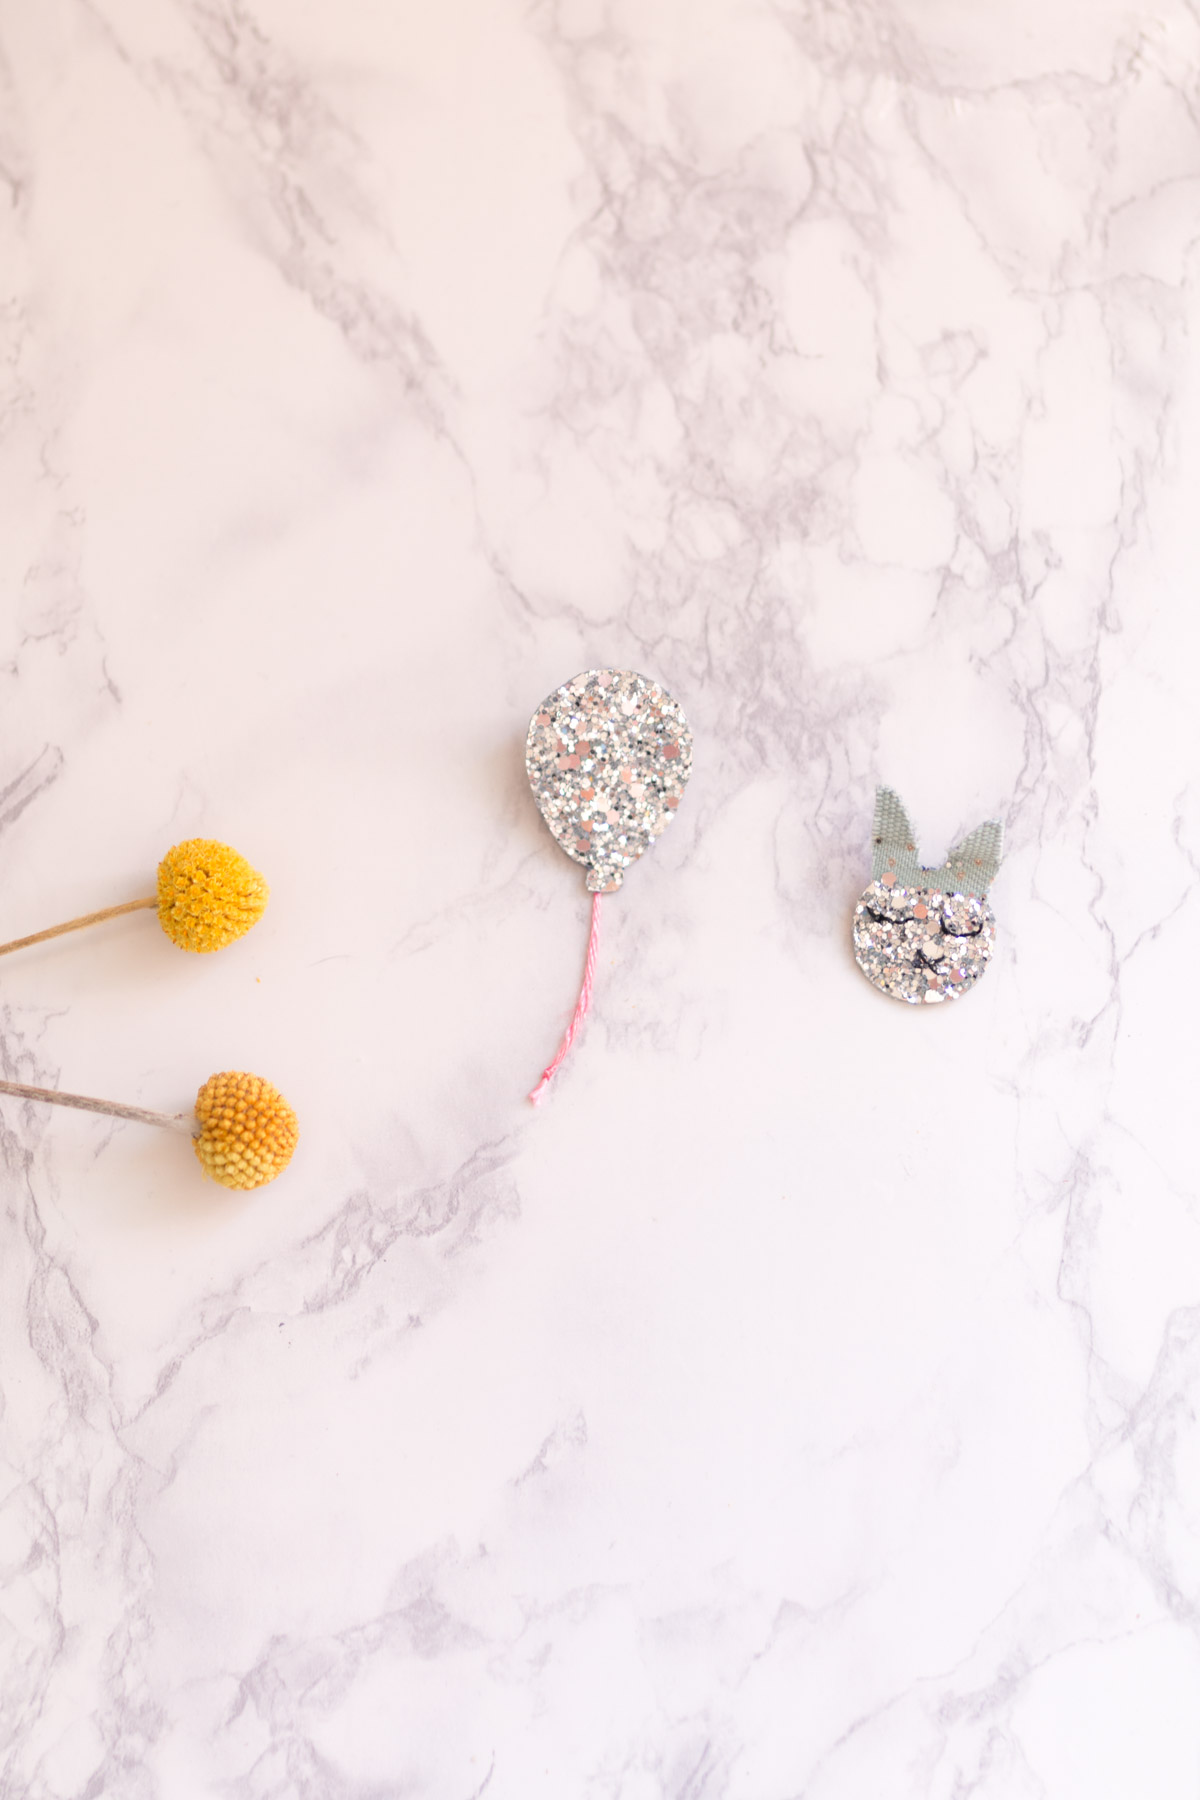 DIY Broche mignonne - cute pin  I Sp4nkblog_-14